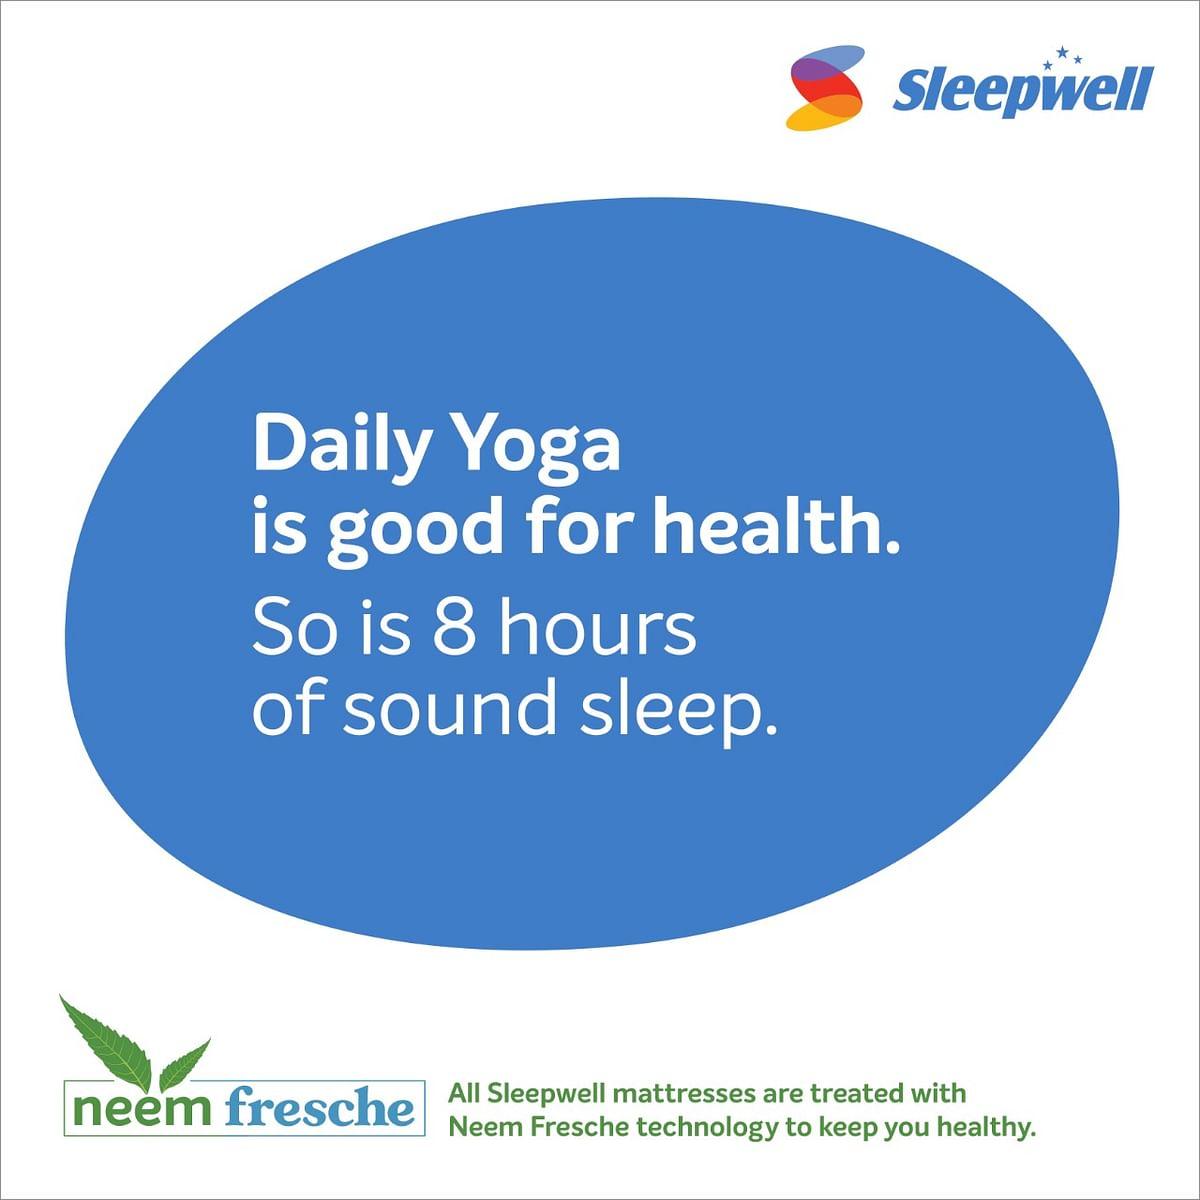 Sleepwell reiterates the importance of sleep